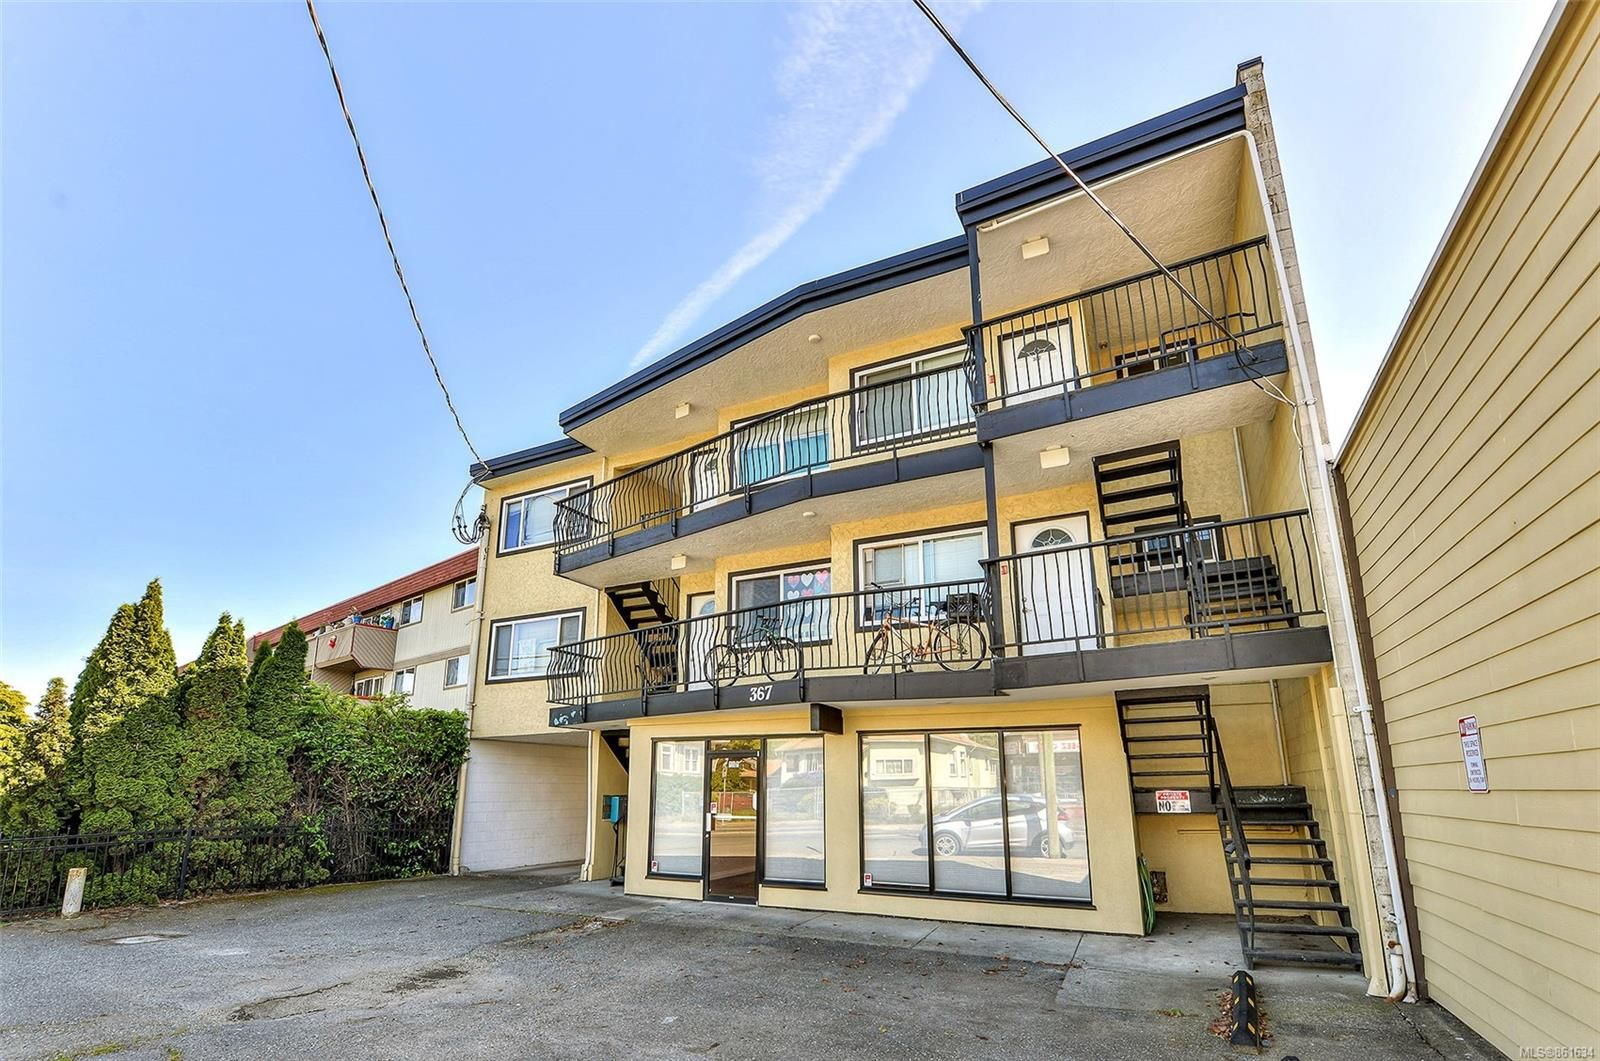 Photo 3: Photos: 367 E Burnside Rd in : Vi Burnside Quadruplex for sale (Victoria)  : MLS®# 861634